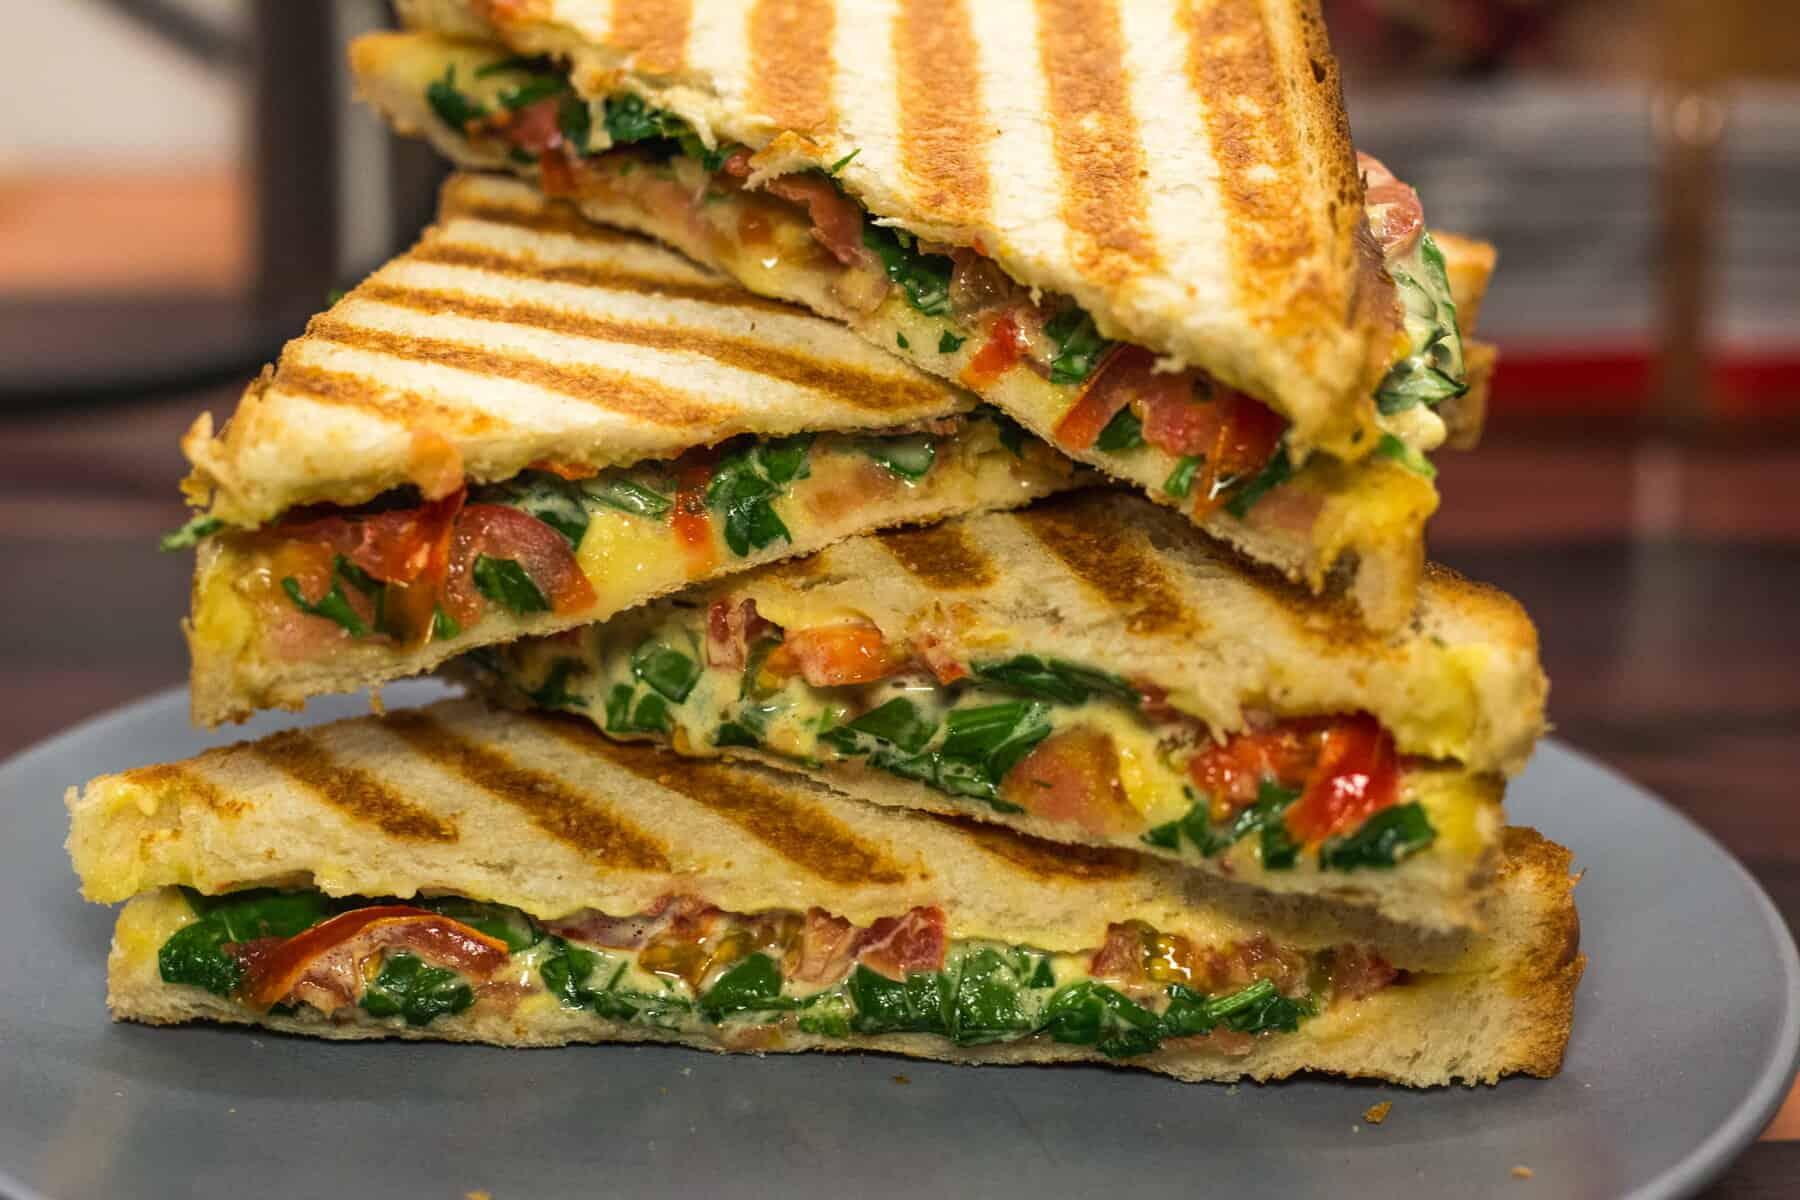 Panini-Sandwich mit Sauce Hollandaise, Bacon, Spinat und Tomate